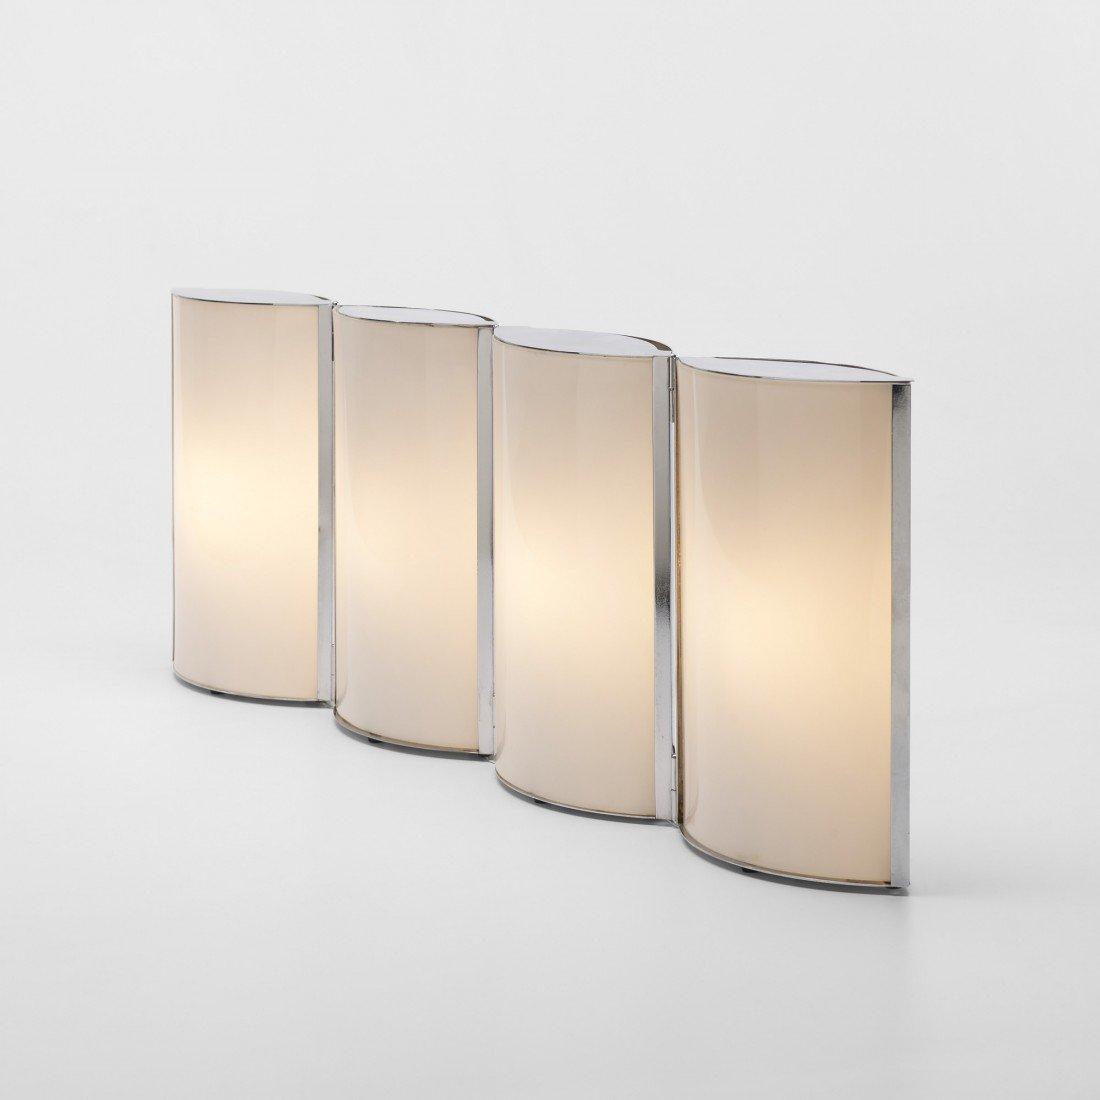 158: Jean-Pierre Vitrac table lamp